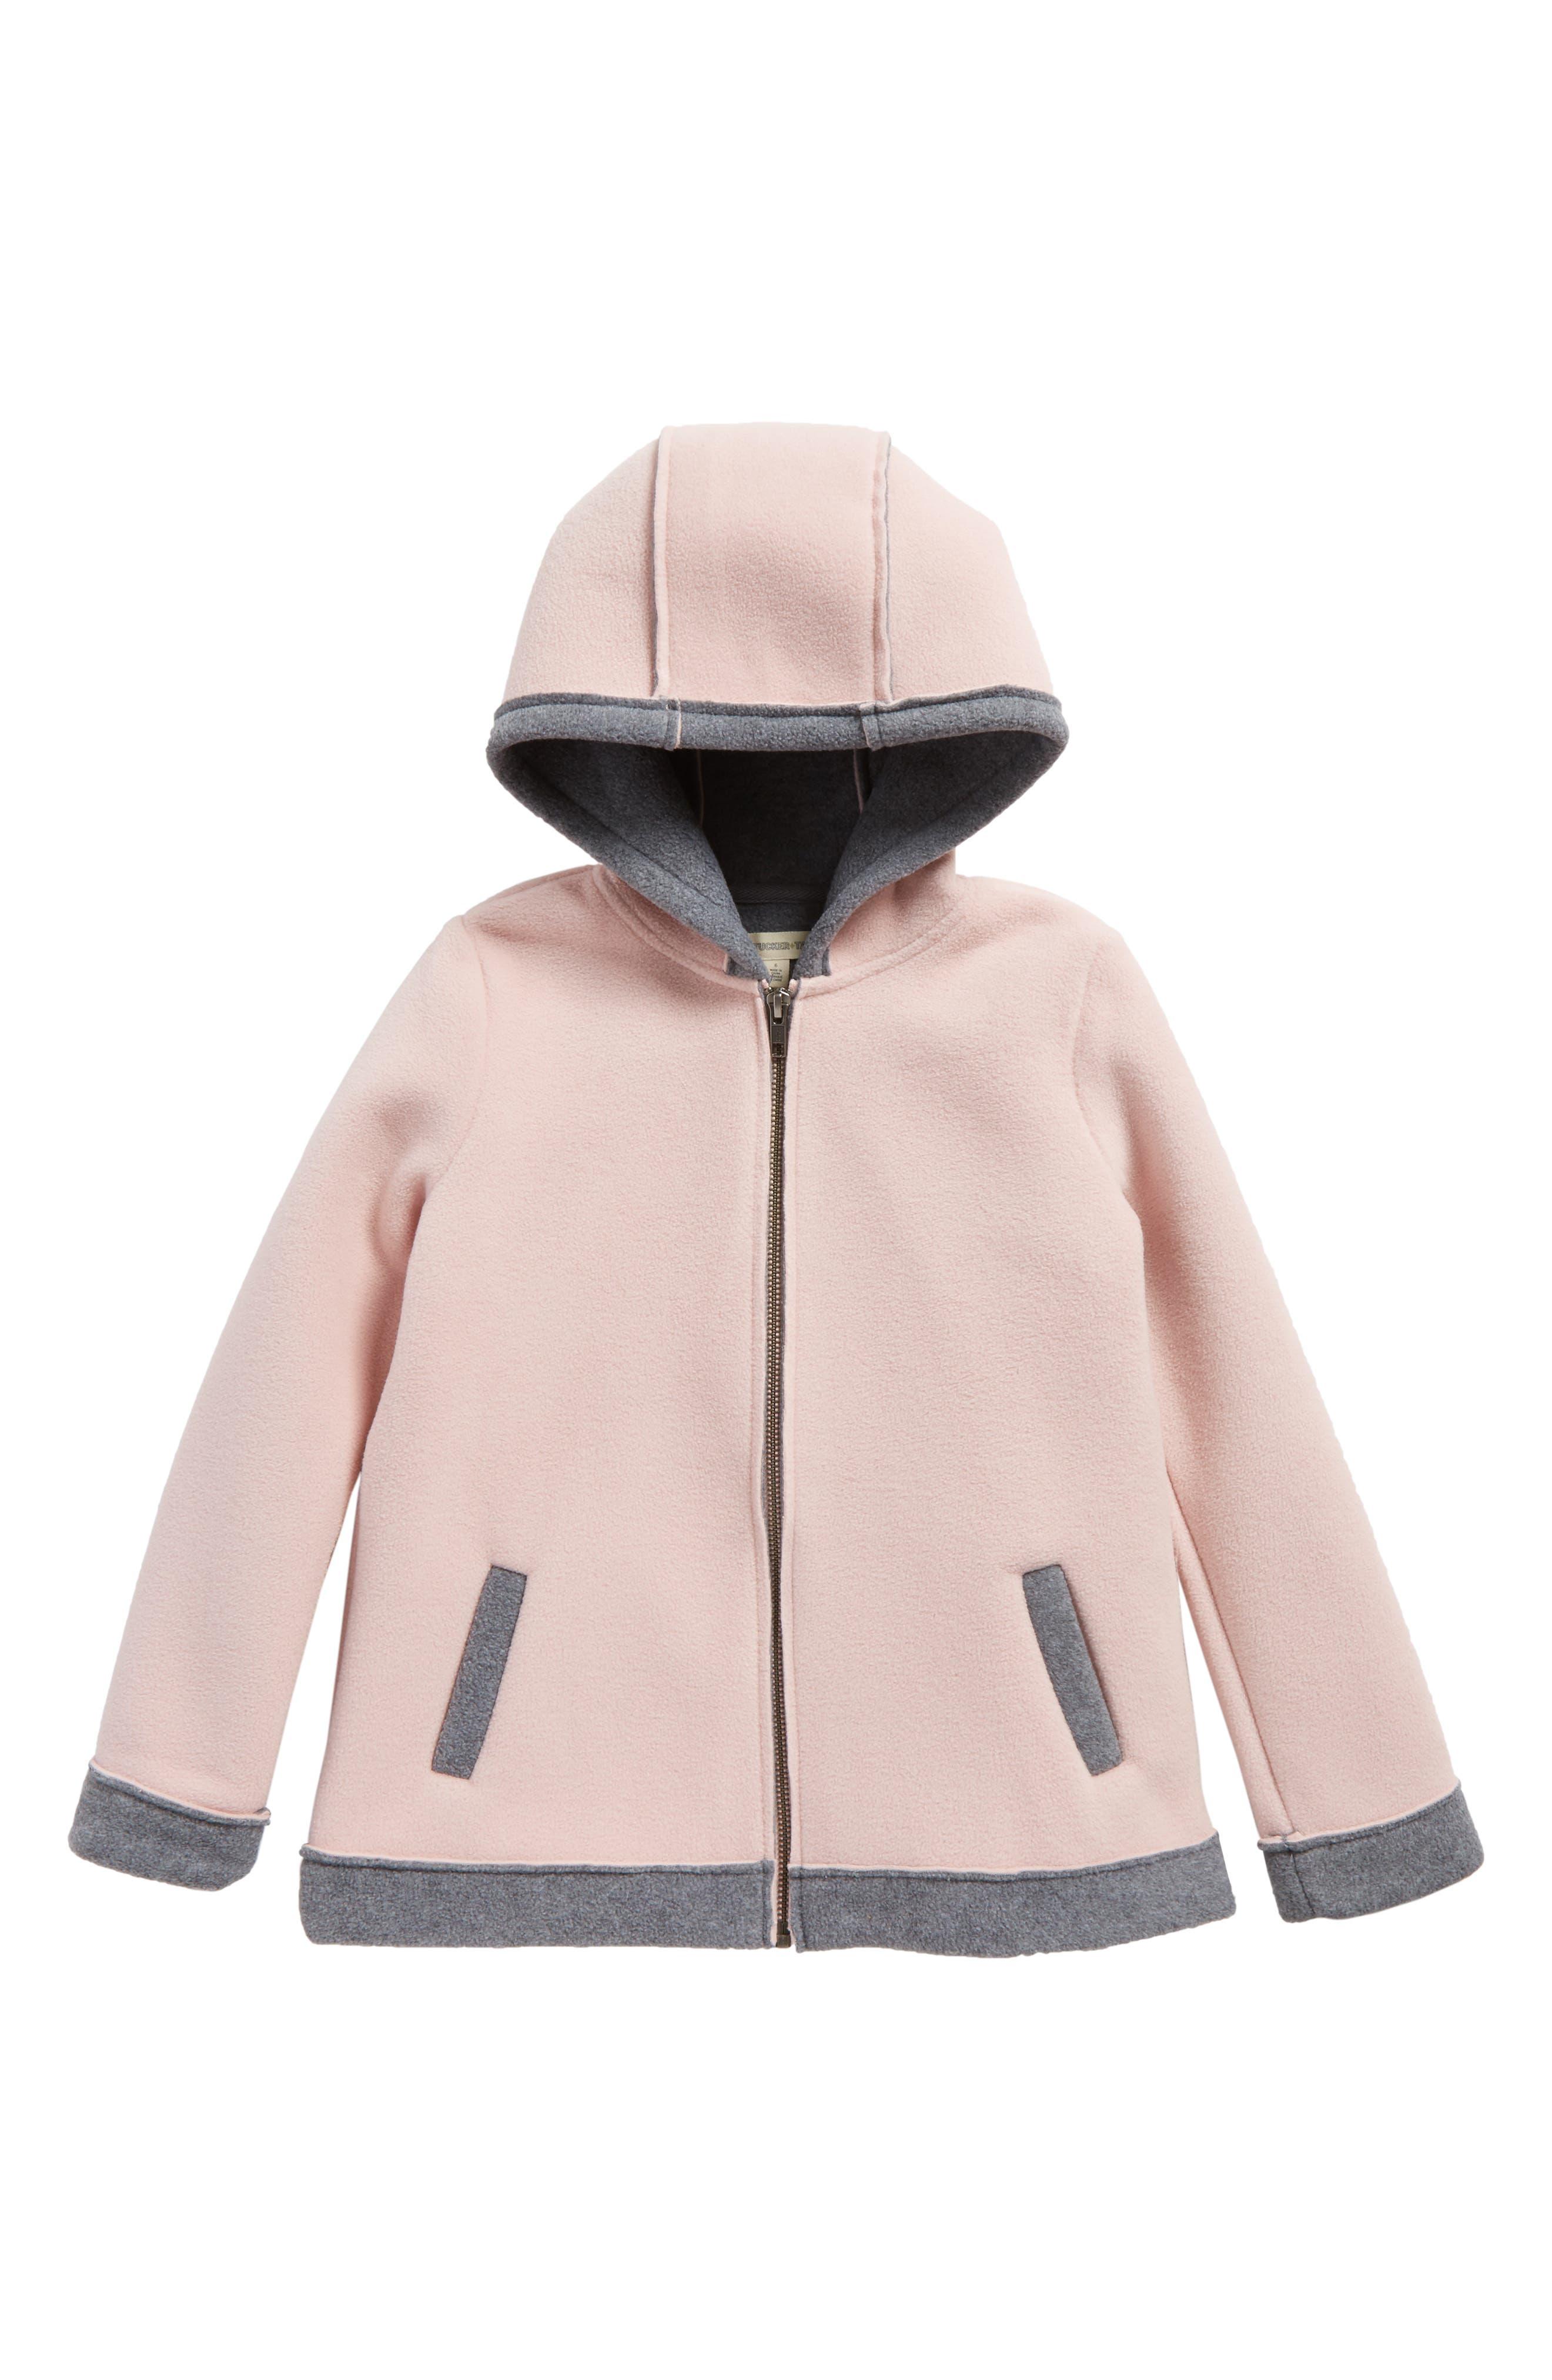 Tucker + Tate Hooded Fleece Jacket (Toddler Girls, Little Girls & Big Girls)